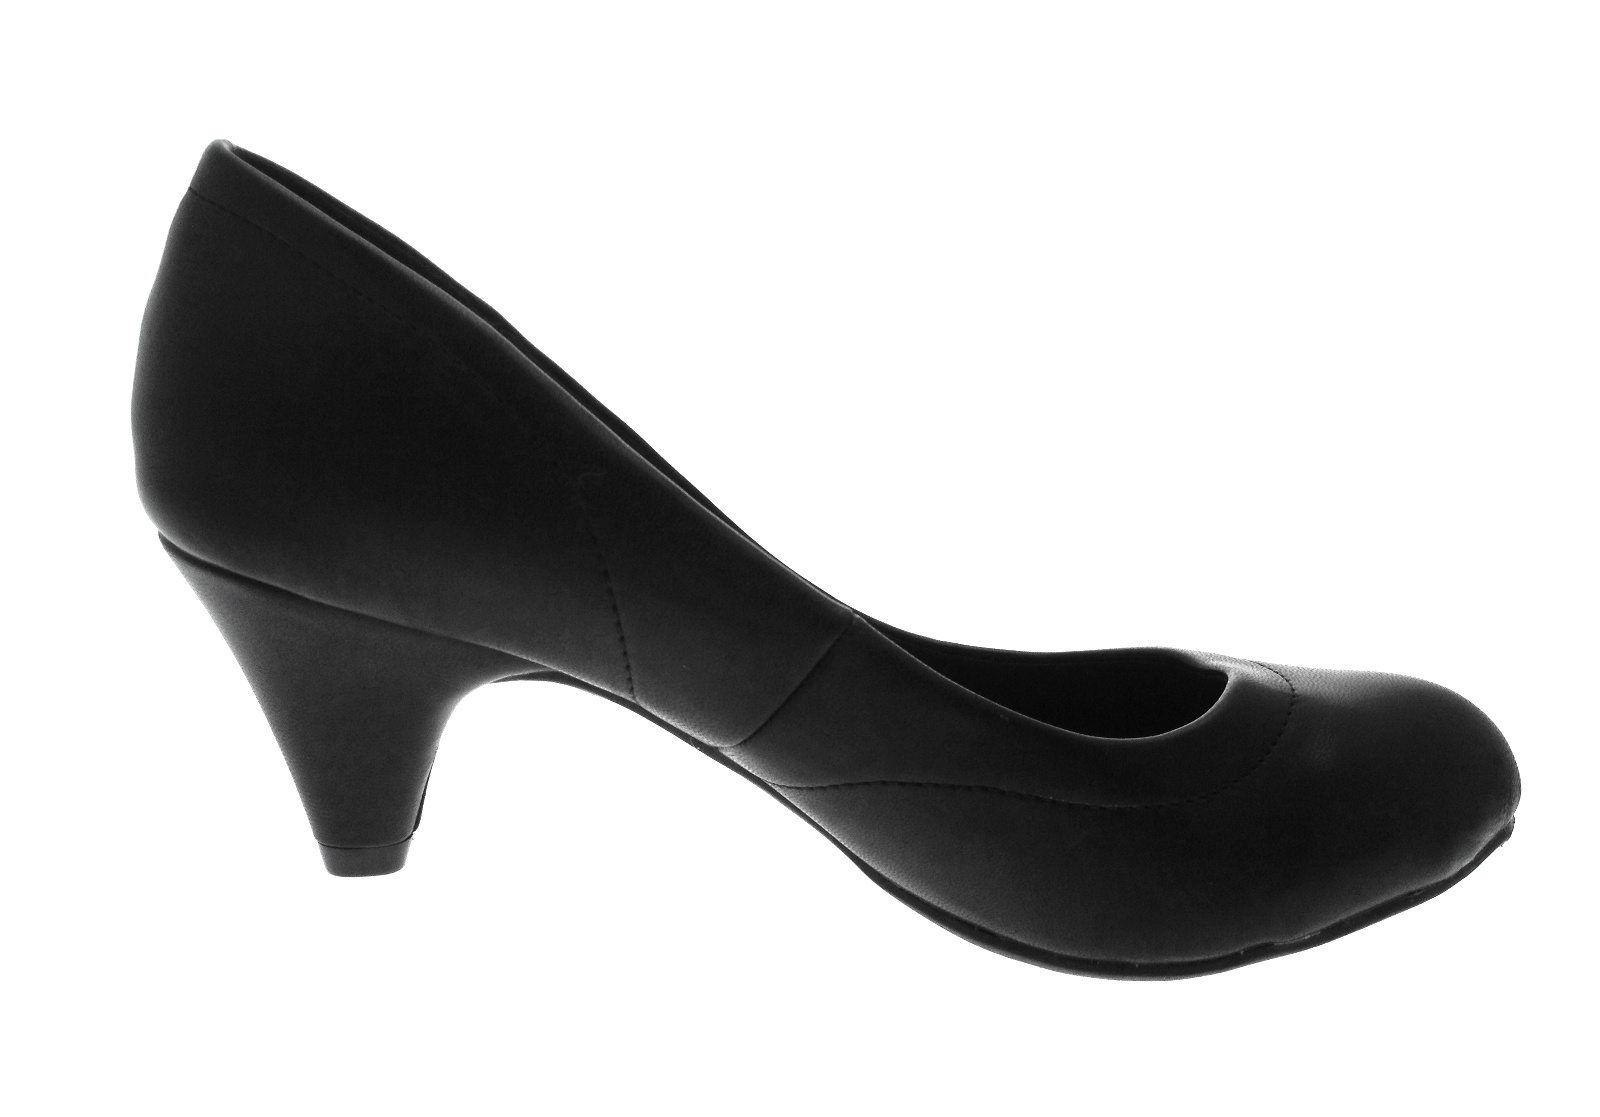 womens low stiletto heels comfort work office everyday